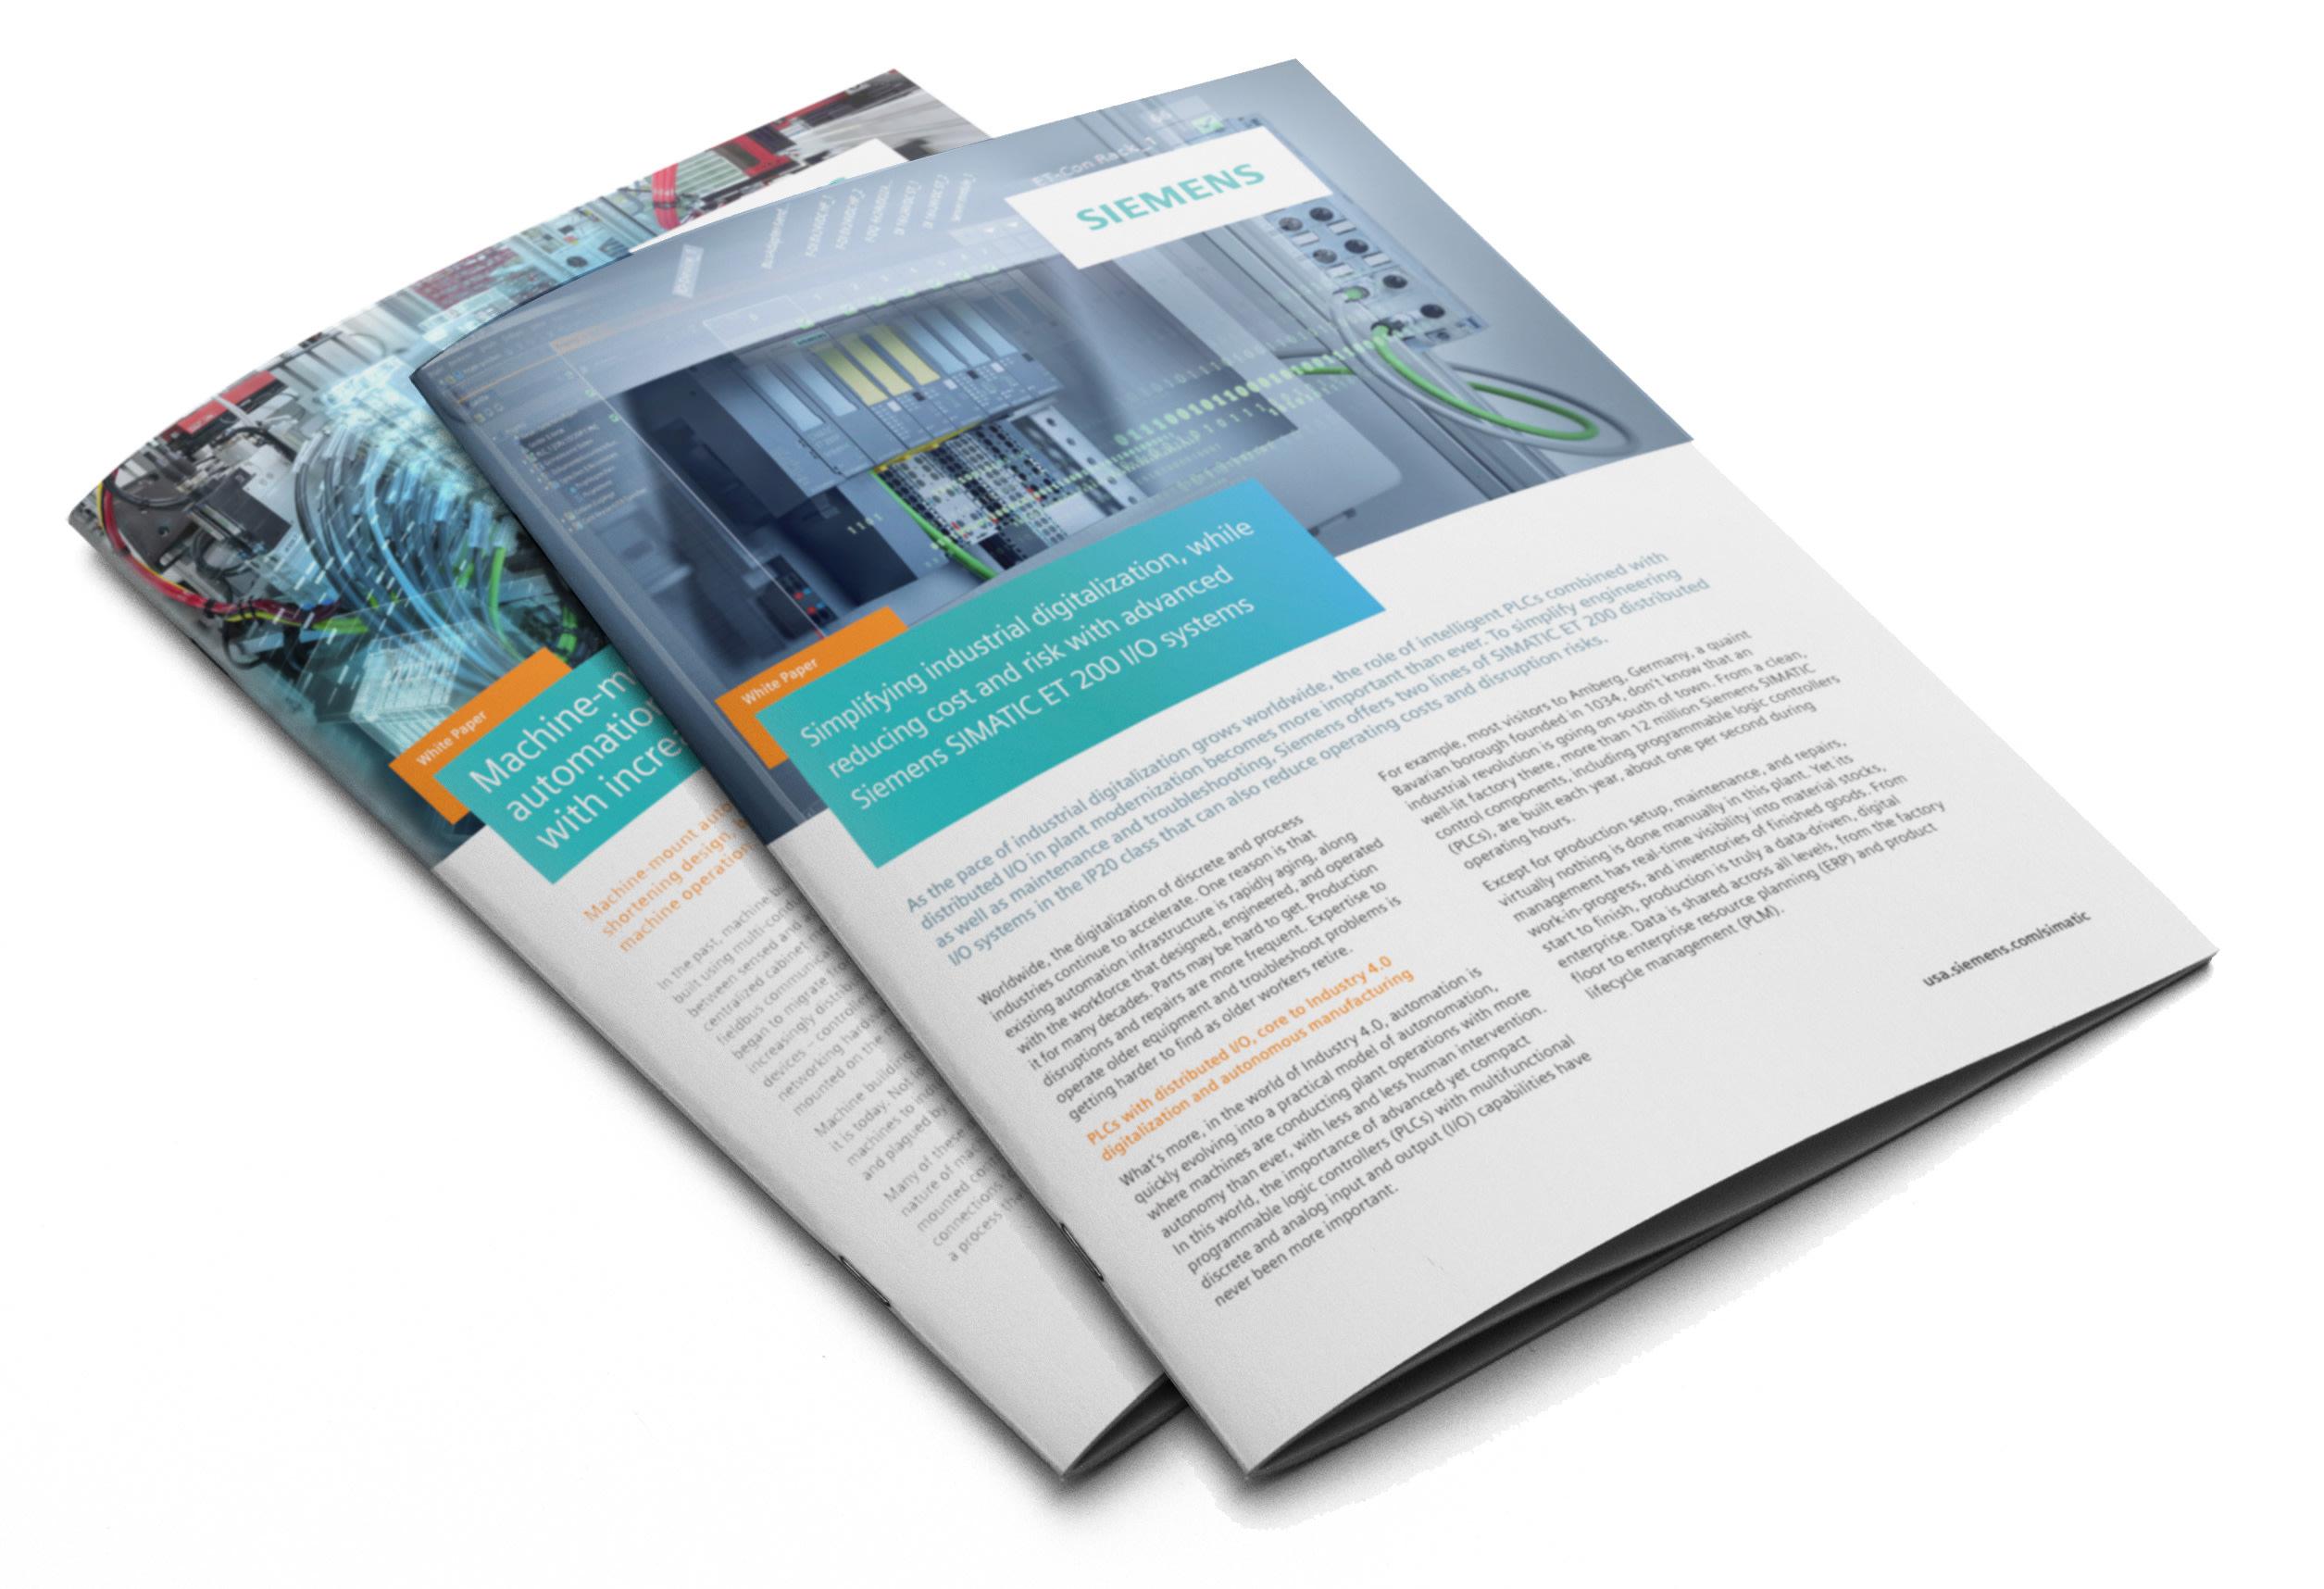 Siemens SIMATIC ET 200 Brochures & White Papers